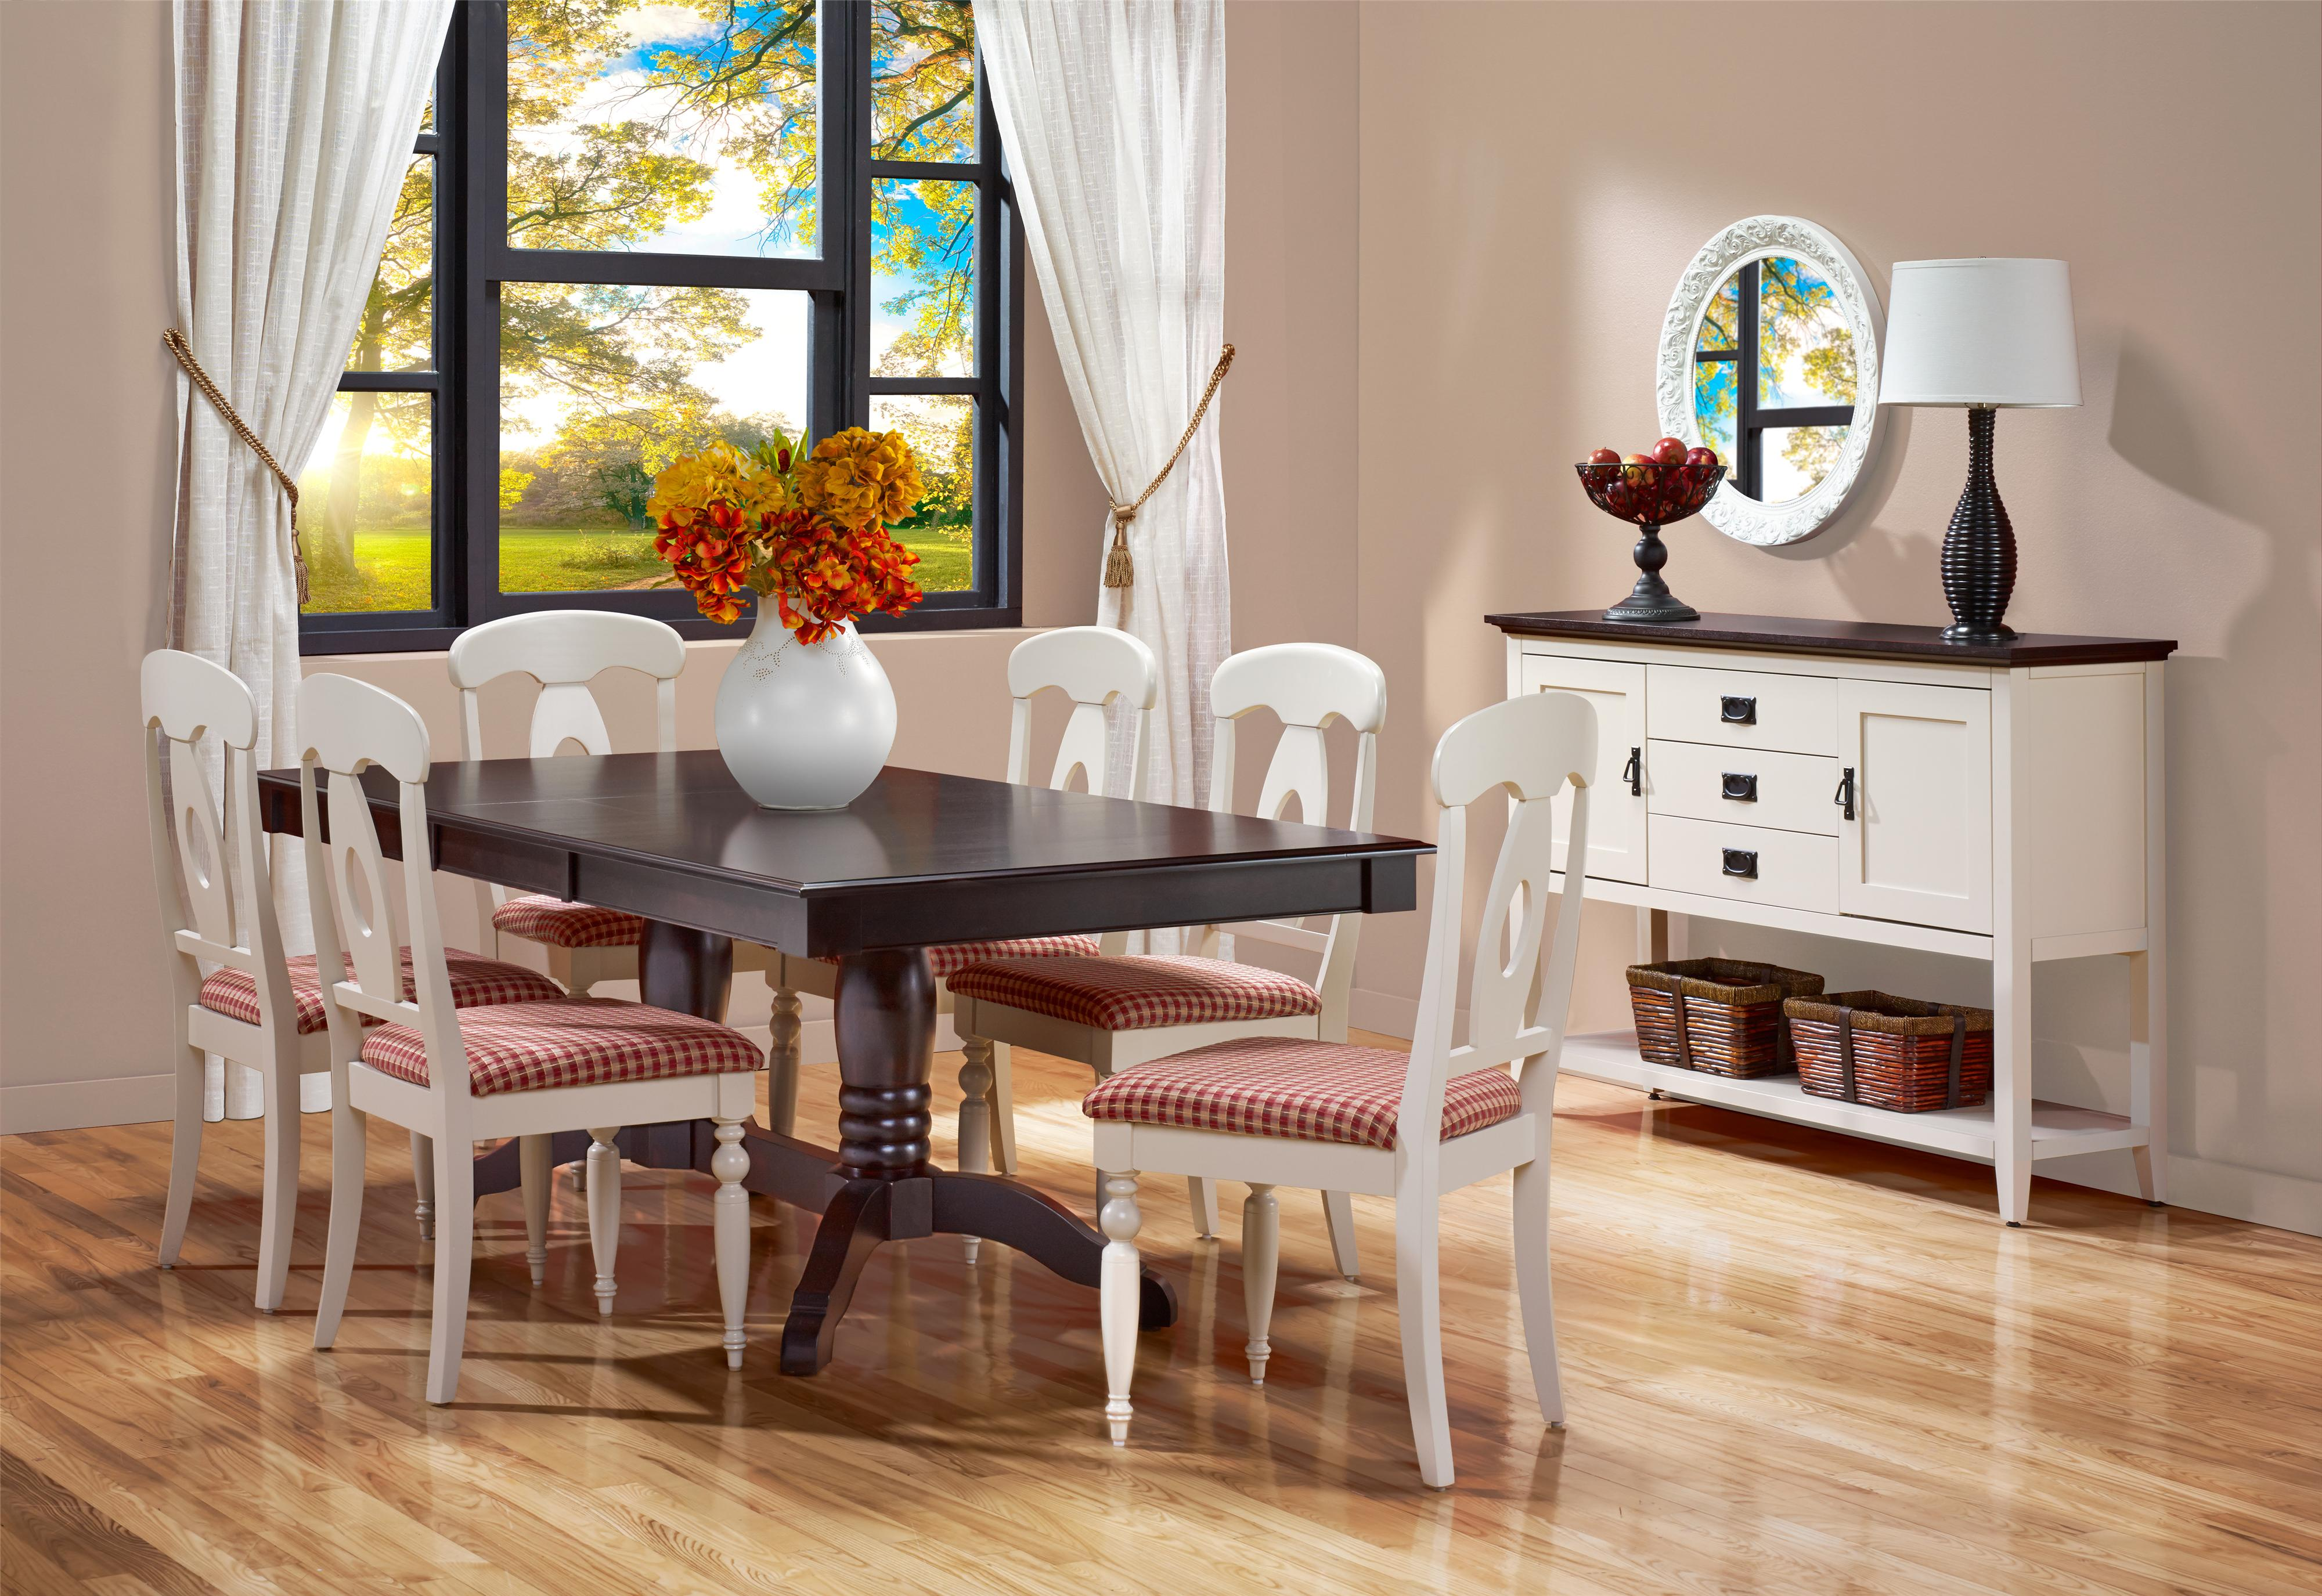 canadel gourmet custom dining customizable rectangular table with leaf trestle base. Black Bedroom Furniture Sets. Home Design Ideas